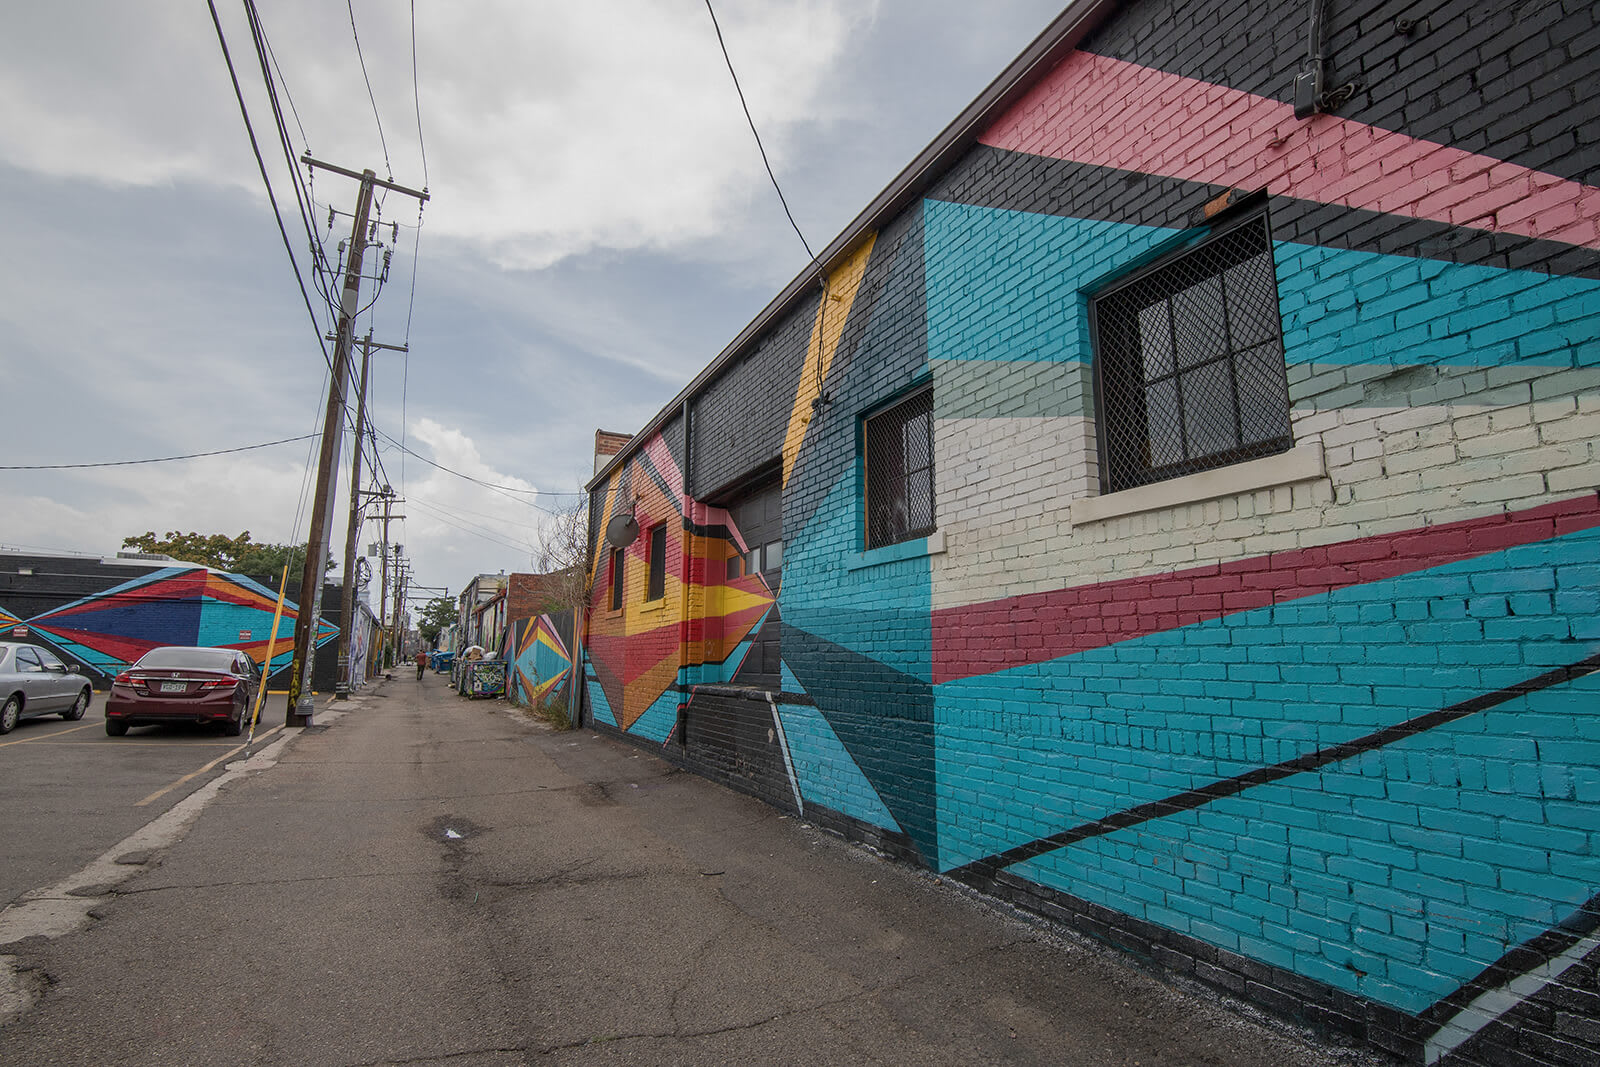 Beautiful Denver Street Art around 1000 Speer by Windsor, Colorado, 80204